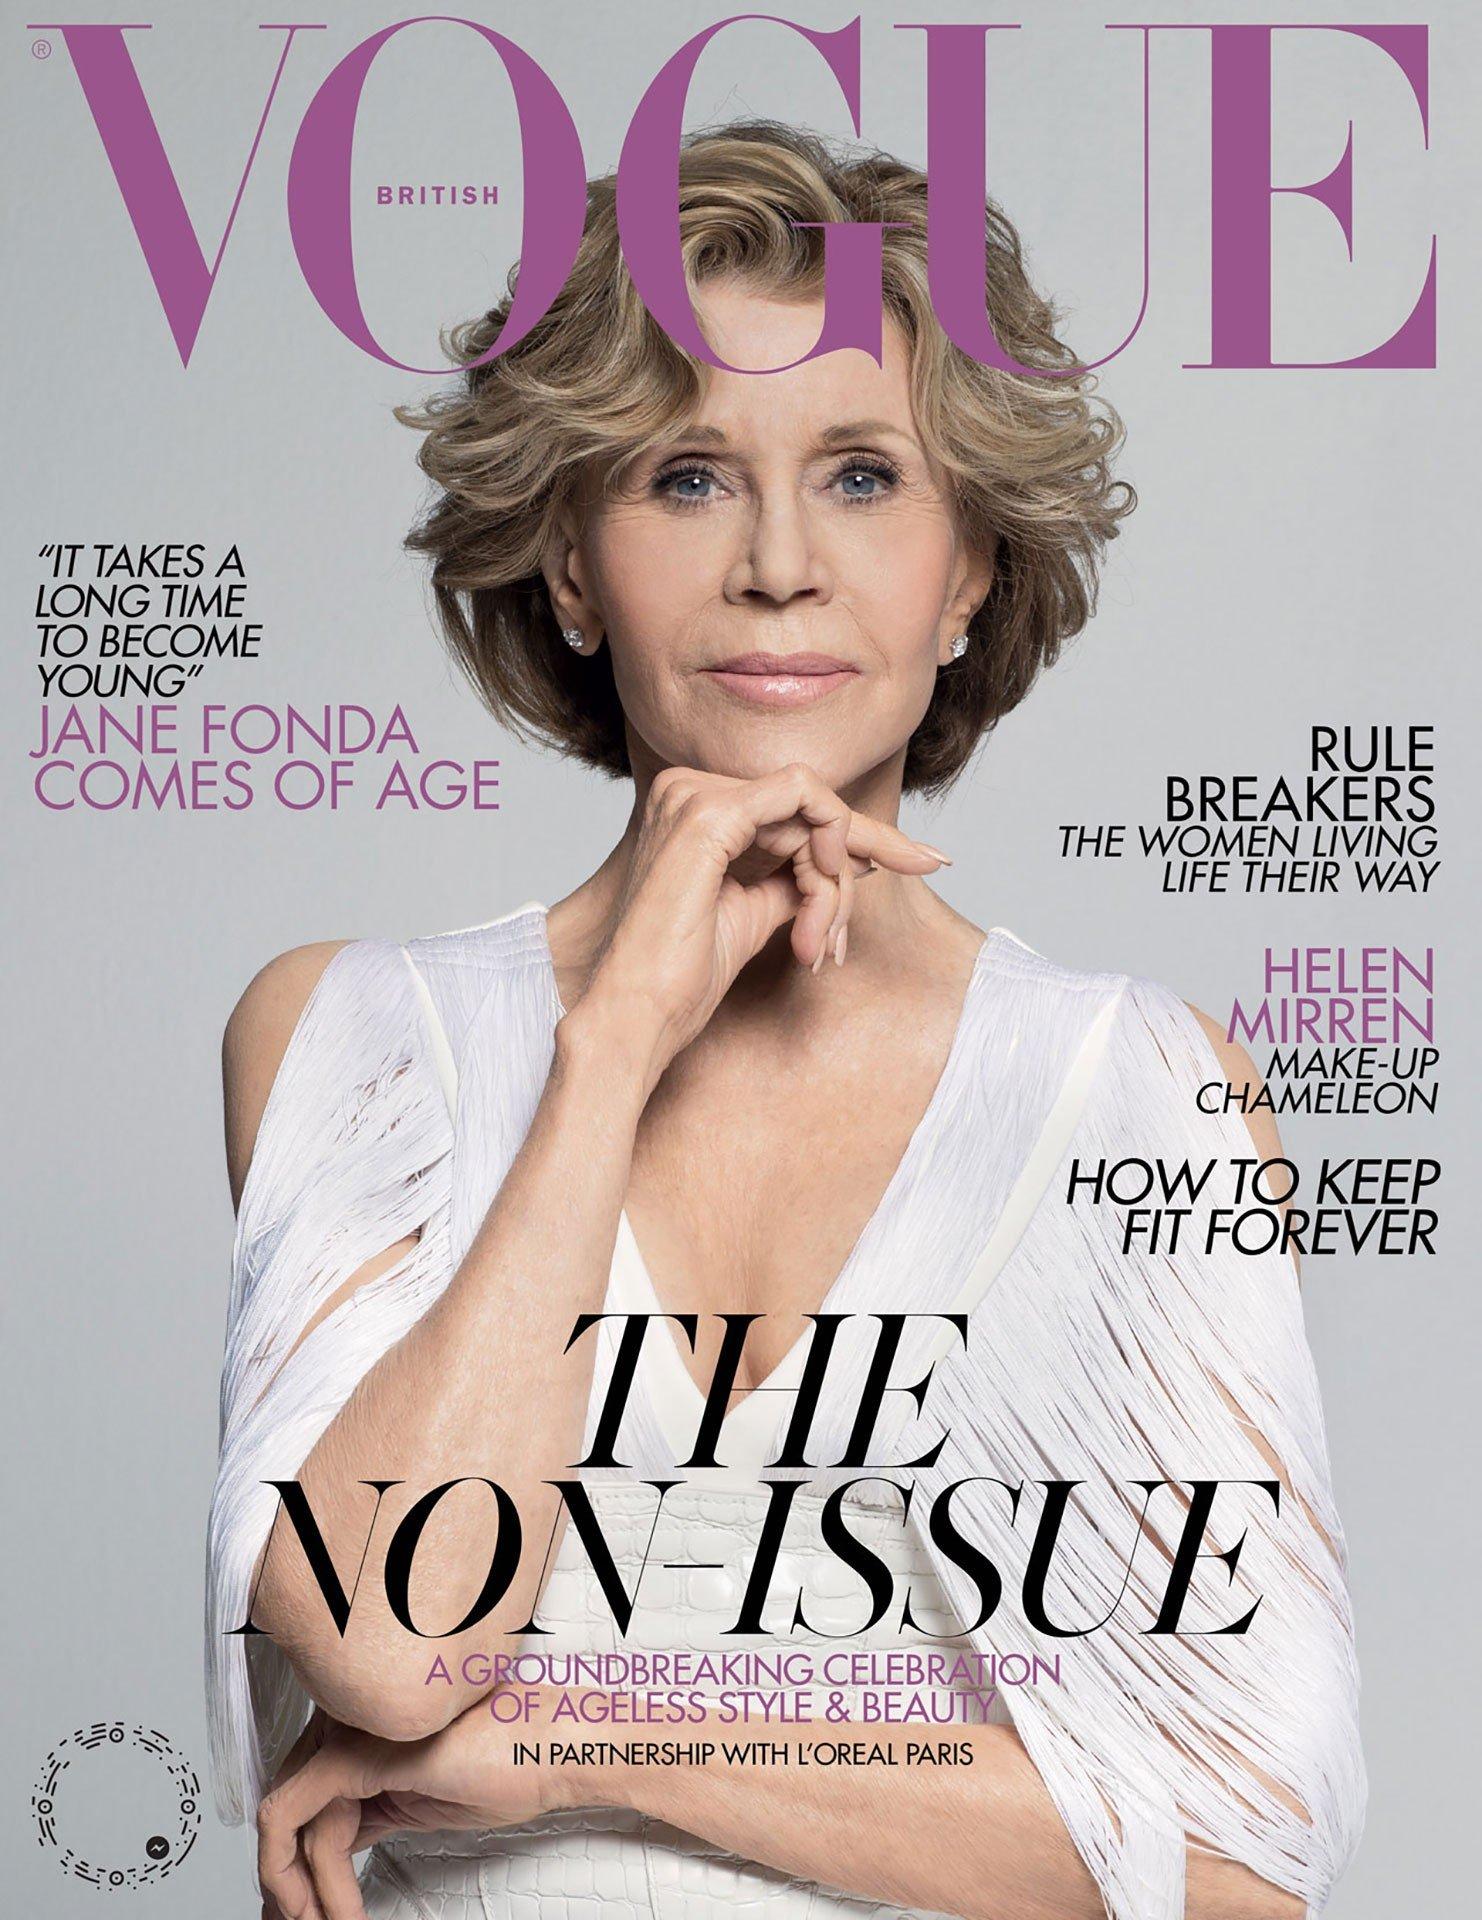 Representation of older women in the media